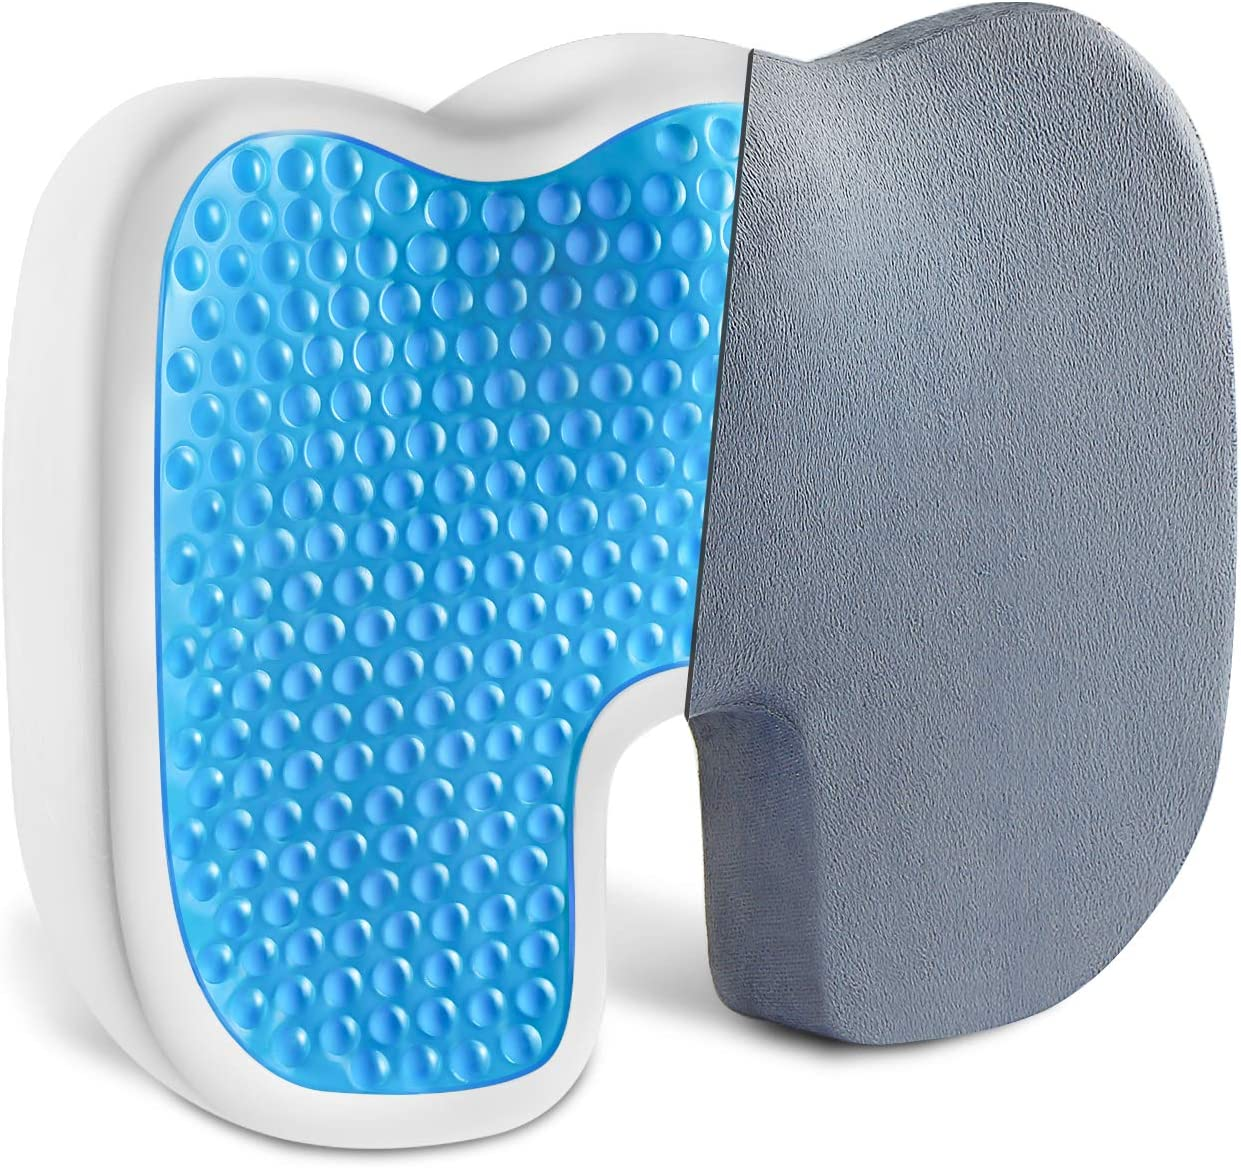 Vanspace Comfort Gel Enhanced Seat Cushion Non-Slip Coccyx Orthopedic Memory Foam Seat Cushion Chair Pillow for Office Chair Car Wheelchair Airplane Seat - Back & Tailbone & Sciatica Pain Relief